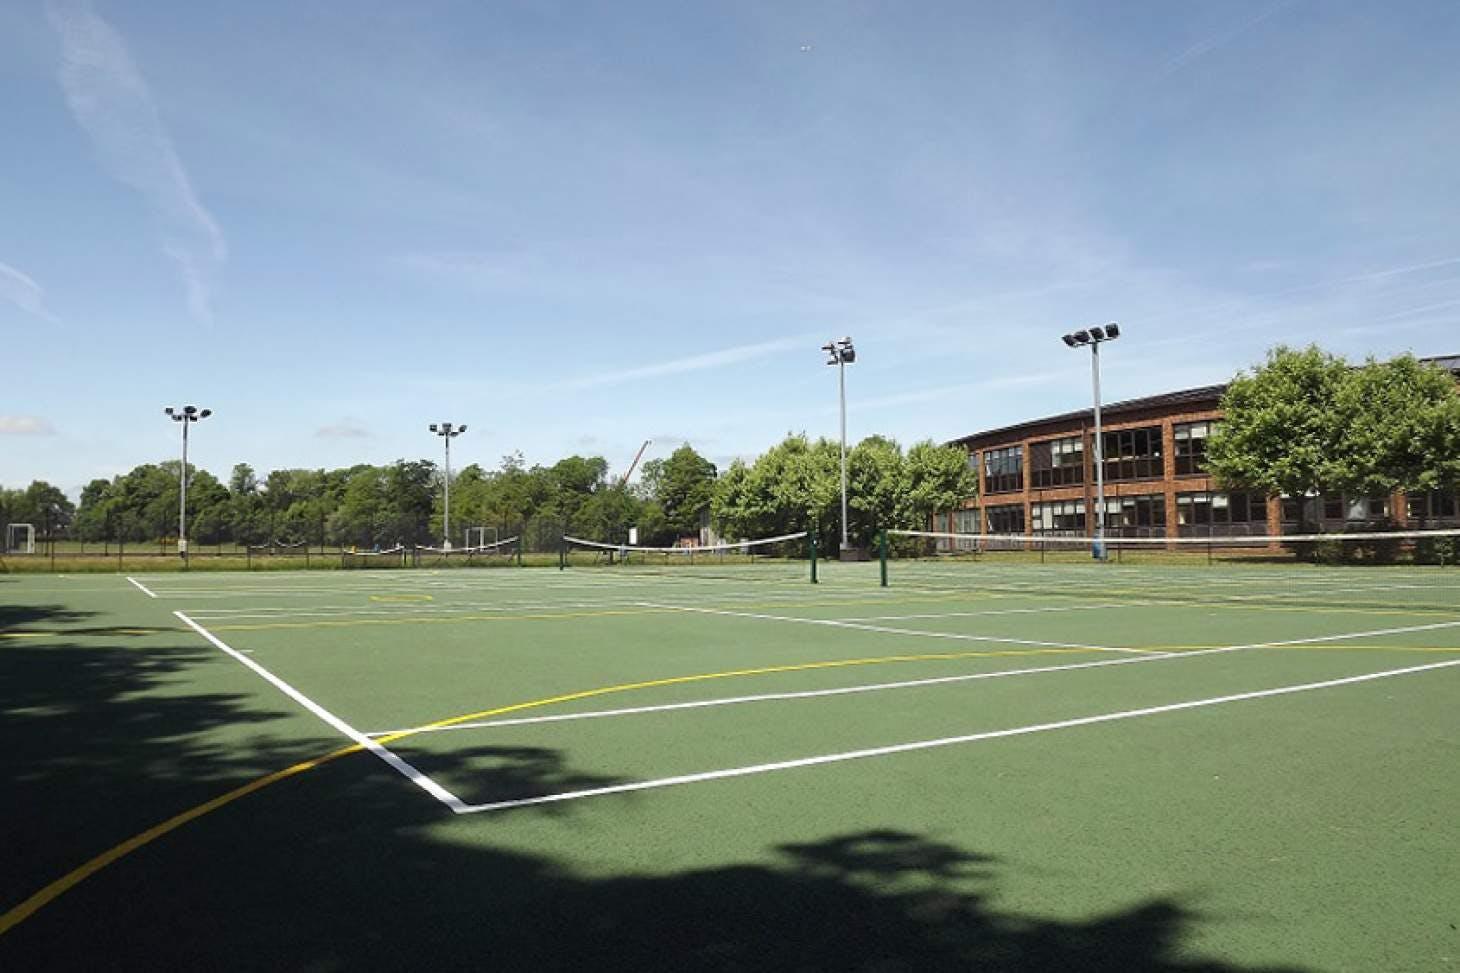 Dr Challoner's High School Outdoor | Hard (macadam) netball court